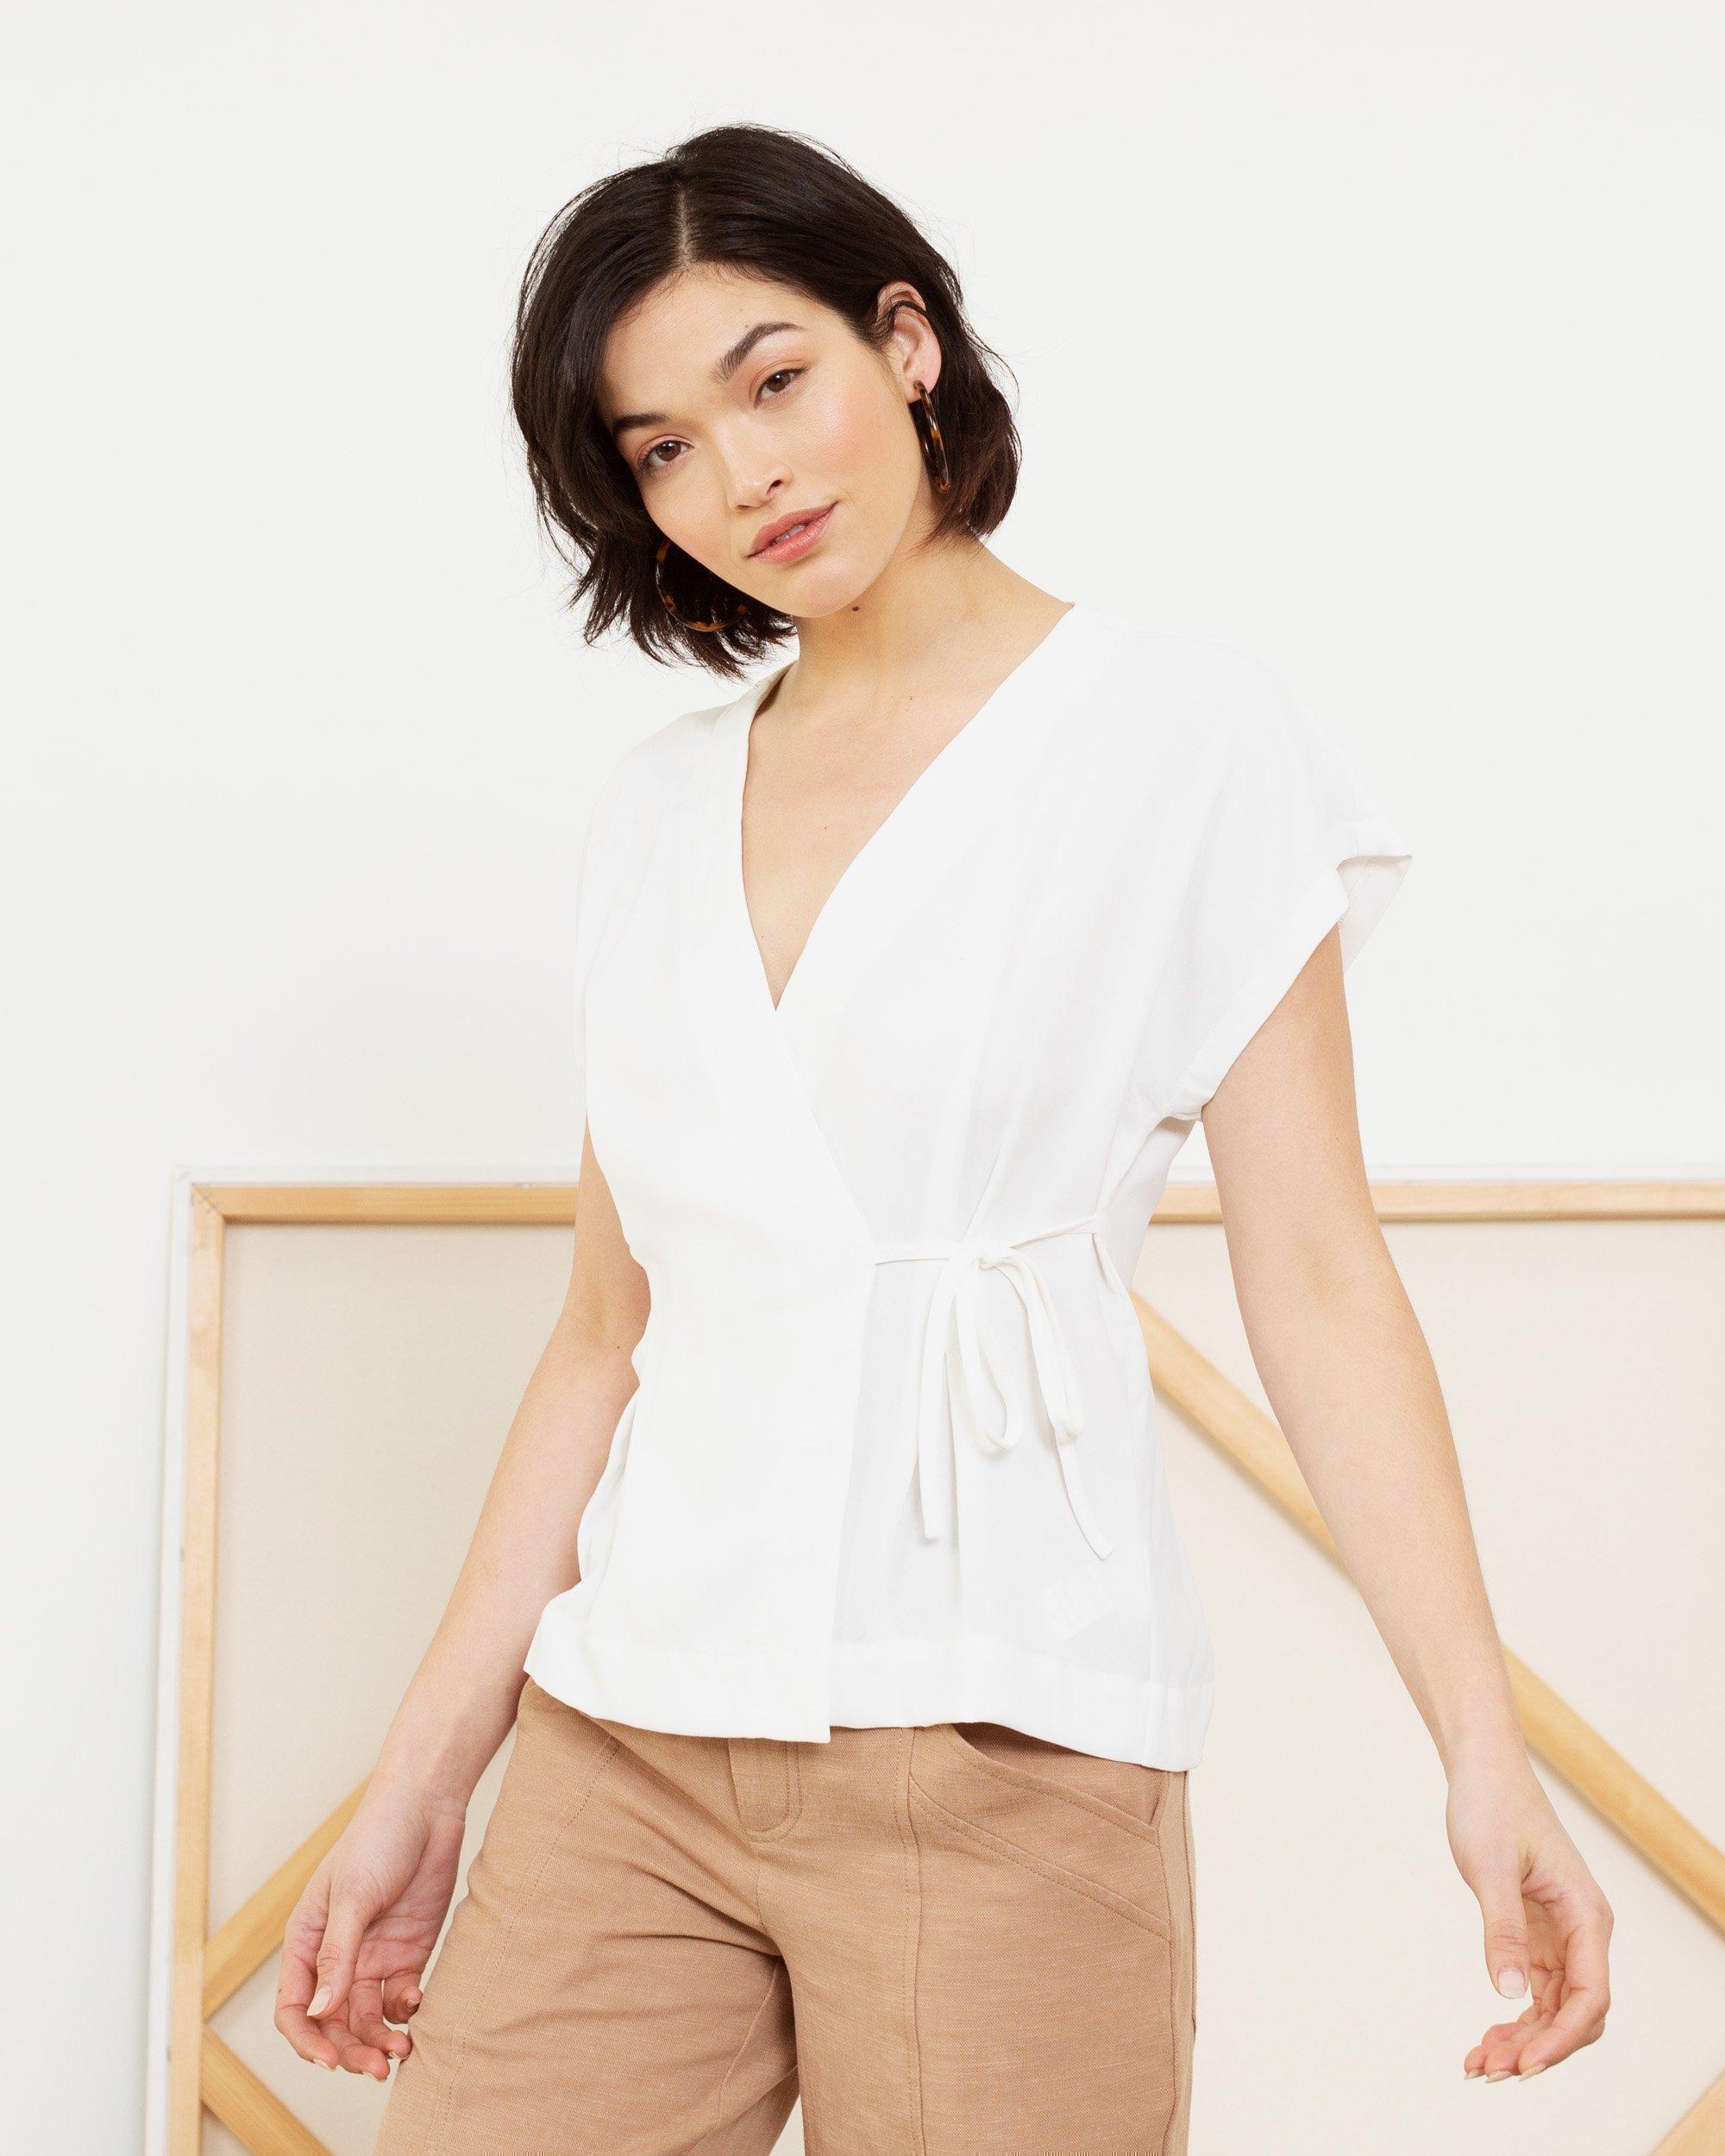 modern-citizen-uma-v-neck-wrap-blouse-blouses-3_c2aec1ea-3410-401a-bb37-f33b82e5f31c.jpg